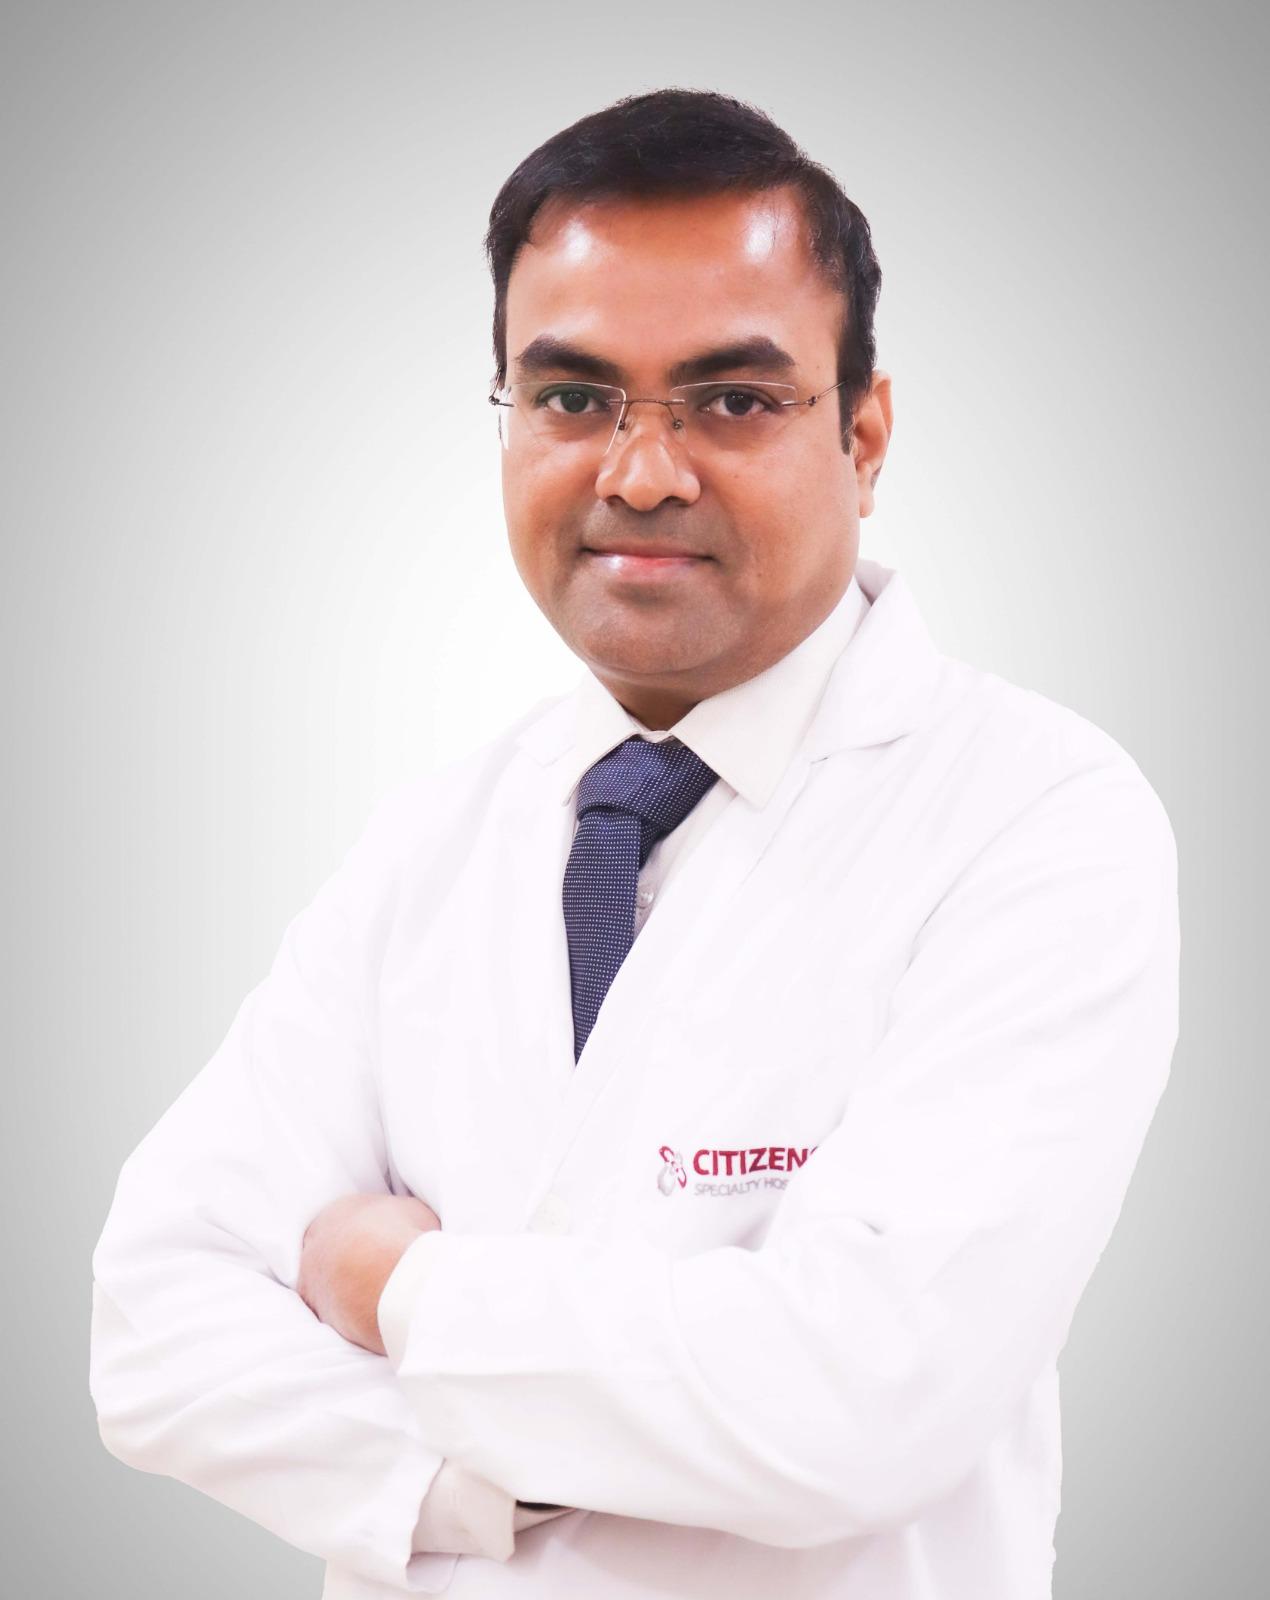 Dr. Nickhil Vangapally